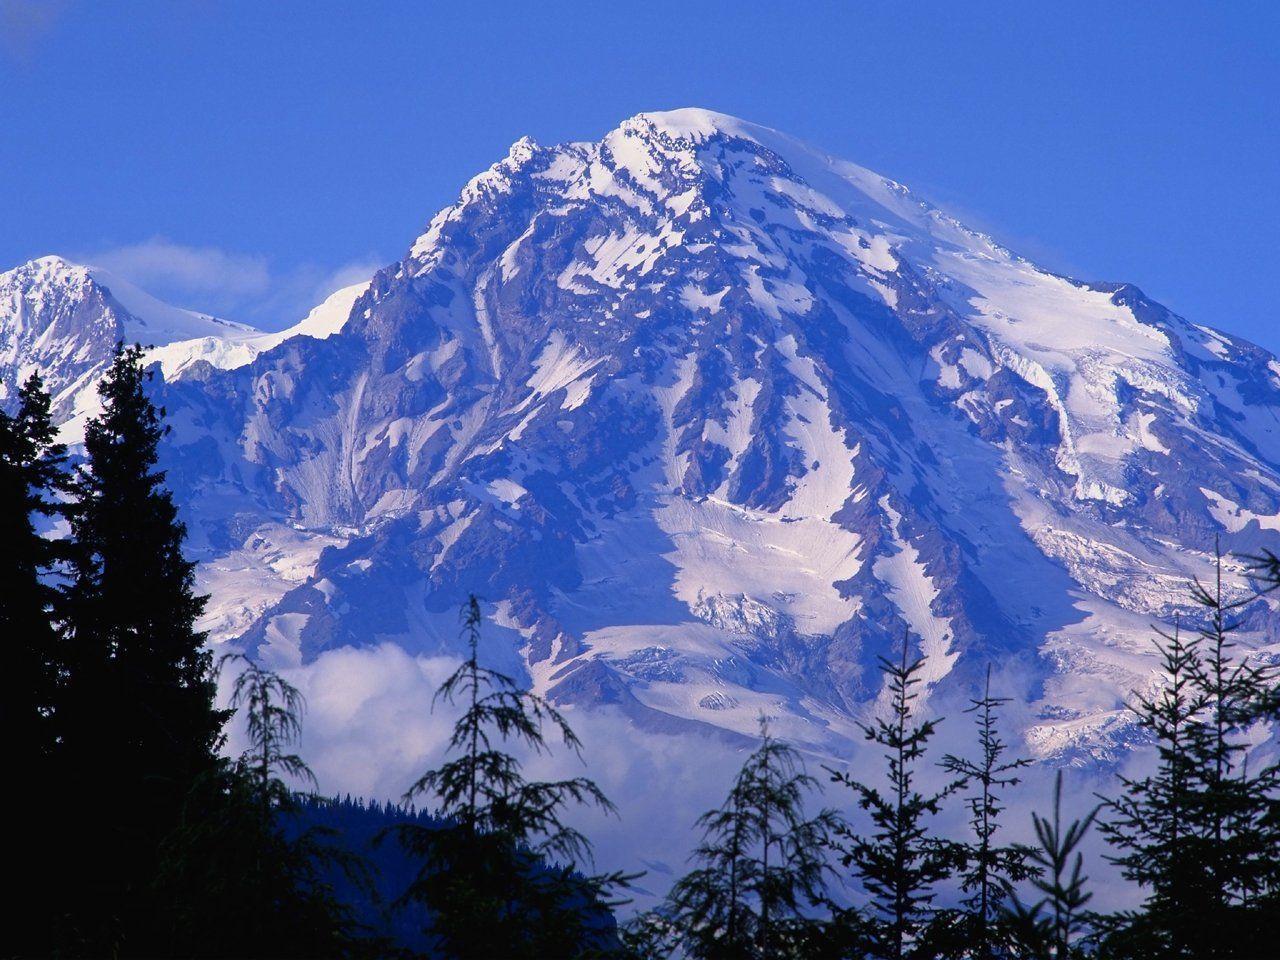 Mount Rainier National Park Wallpapers 1280x960